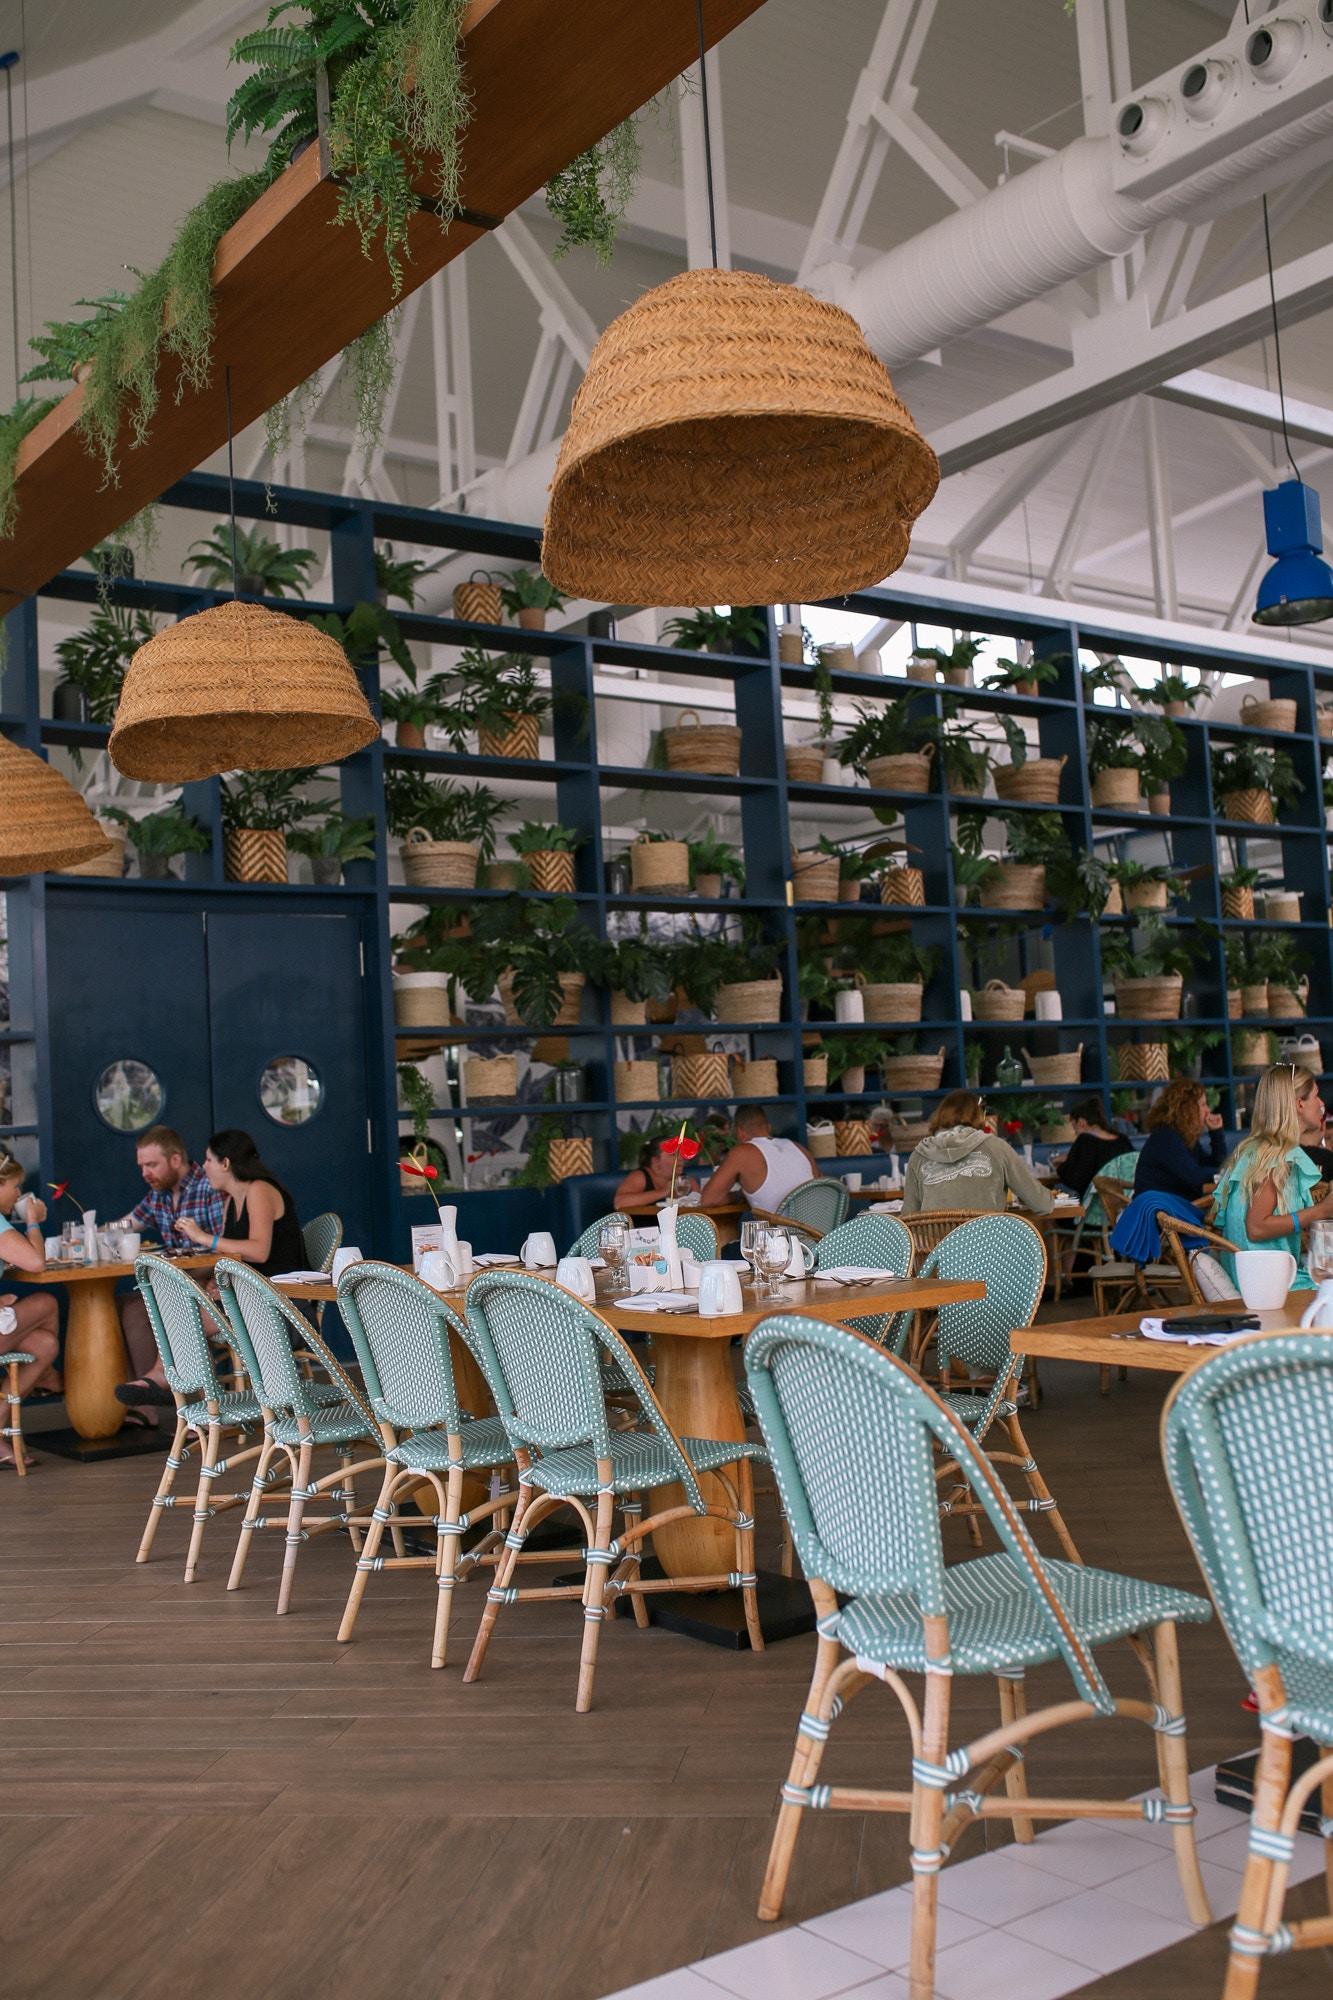 Ocean Riviera Paradise Review: Hotel Design